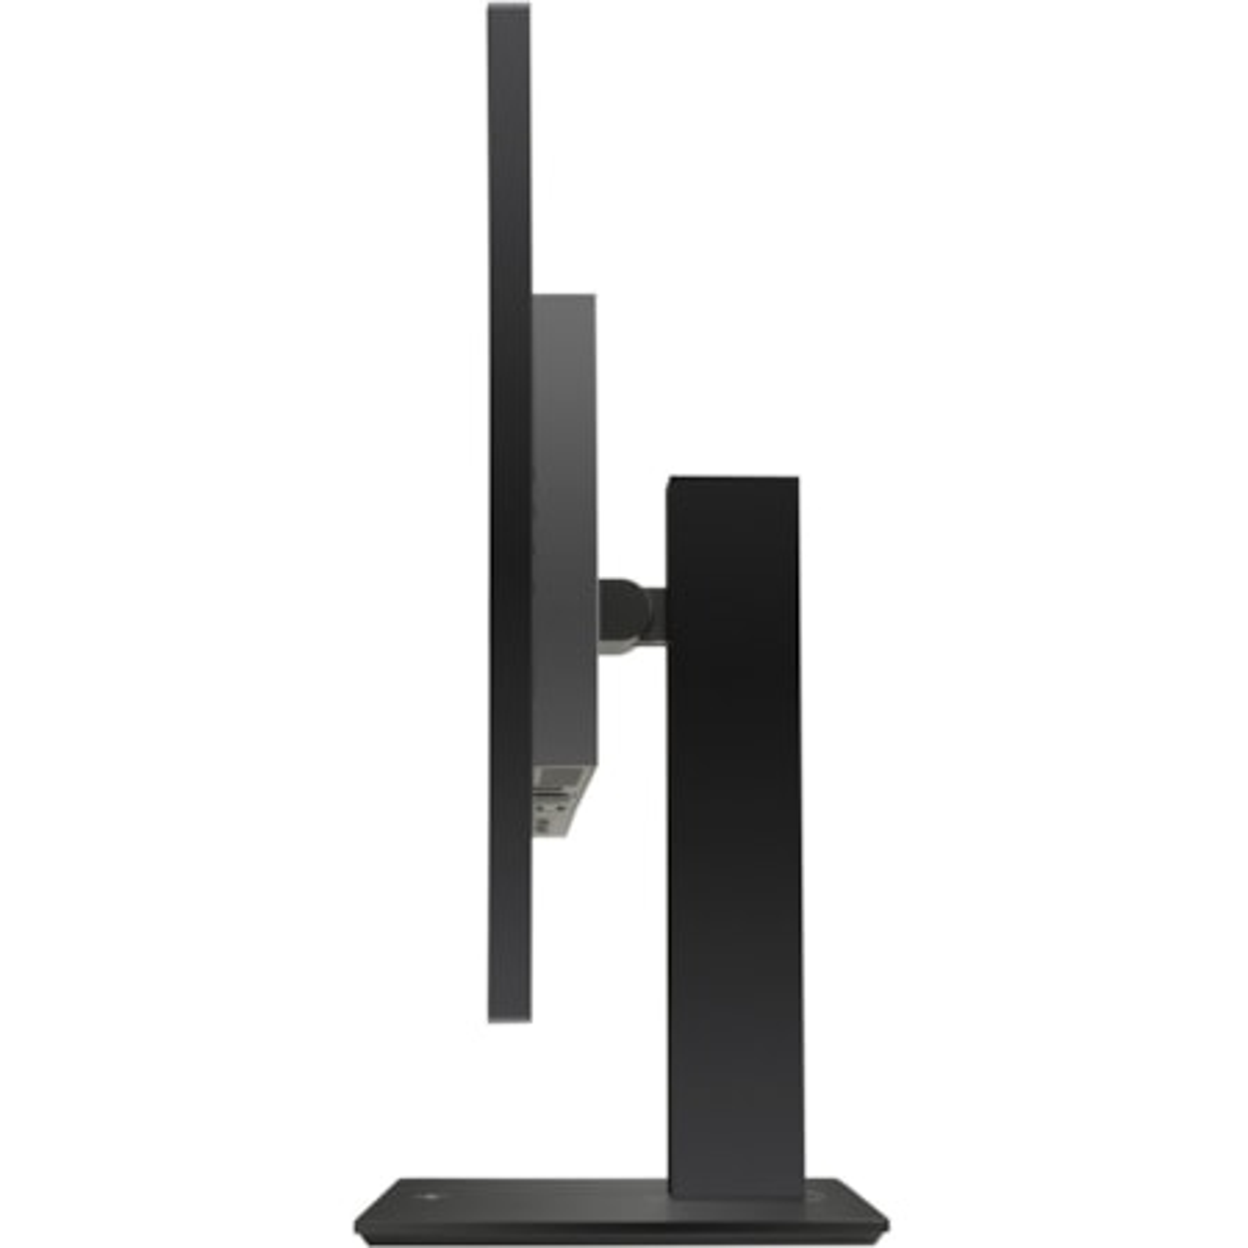 "HP Business Z32 80 cm (31.5"") 4K UHD LED LCD Monitor - 16:9"